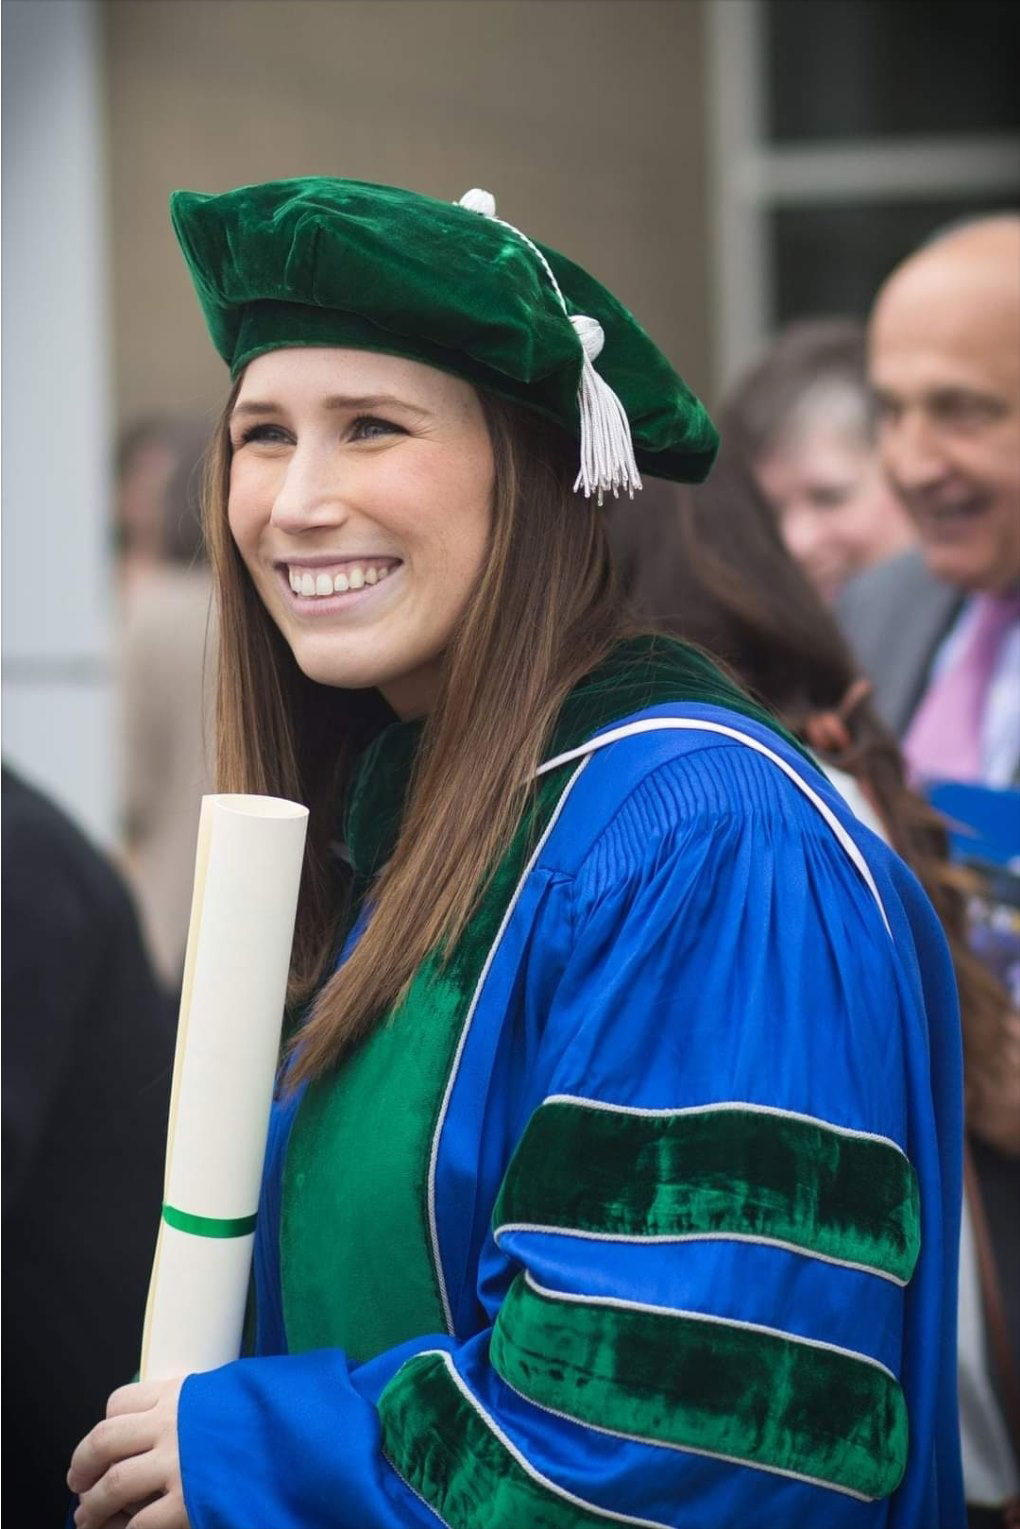 Dr. Adeline Fagan